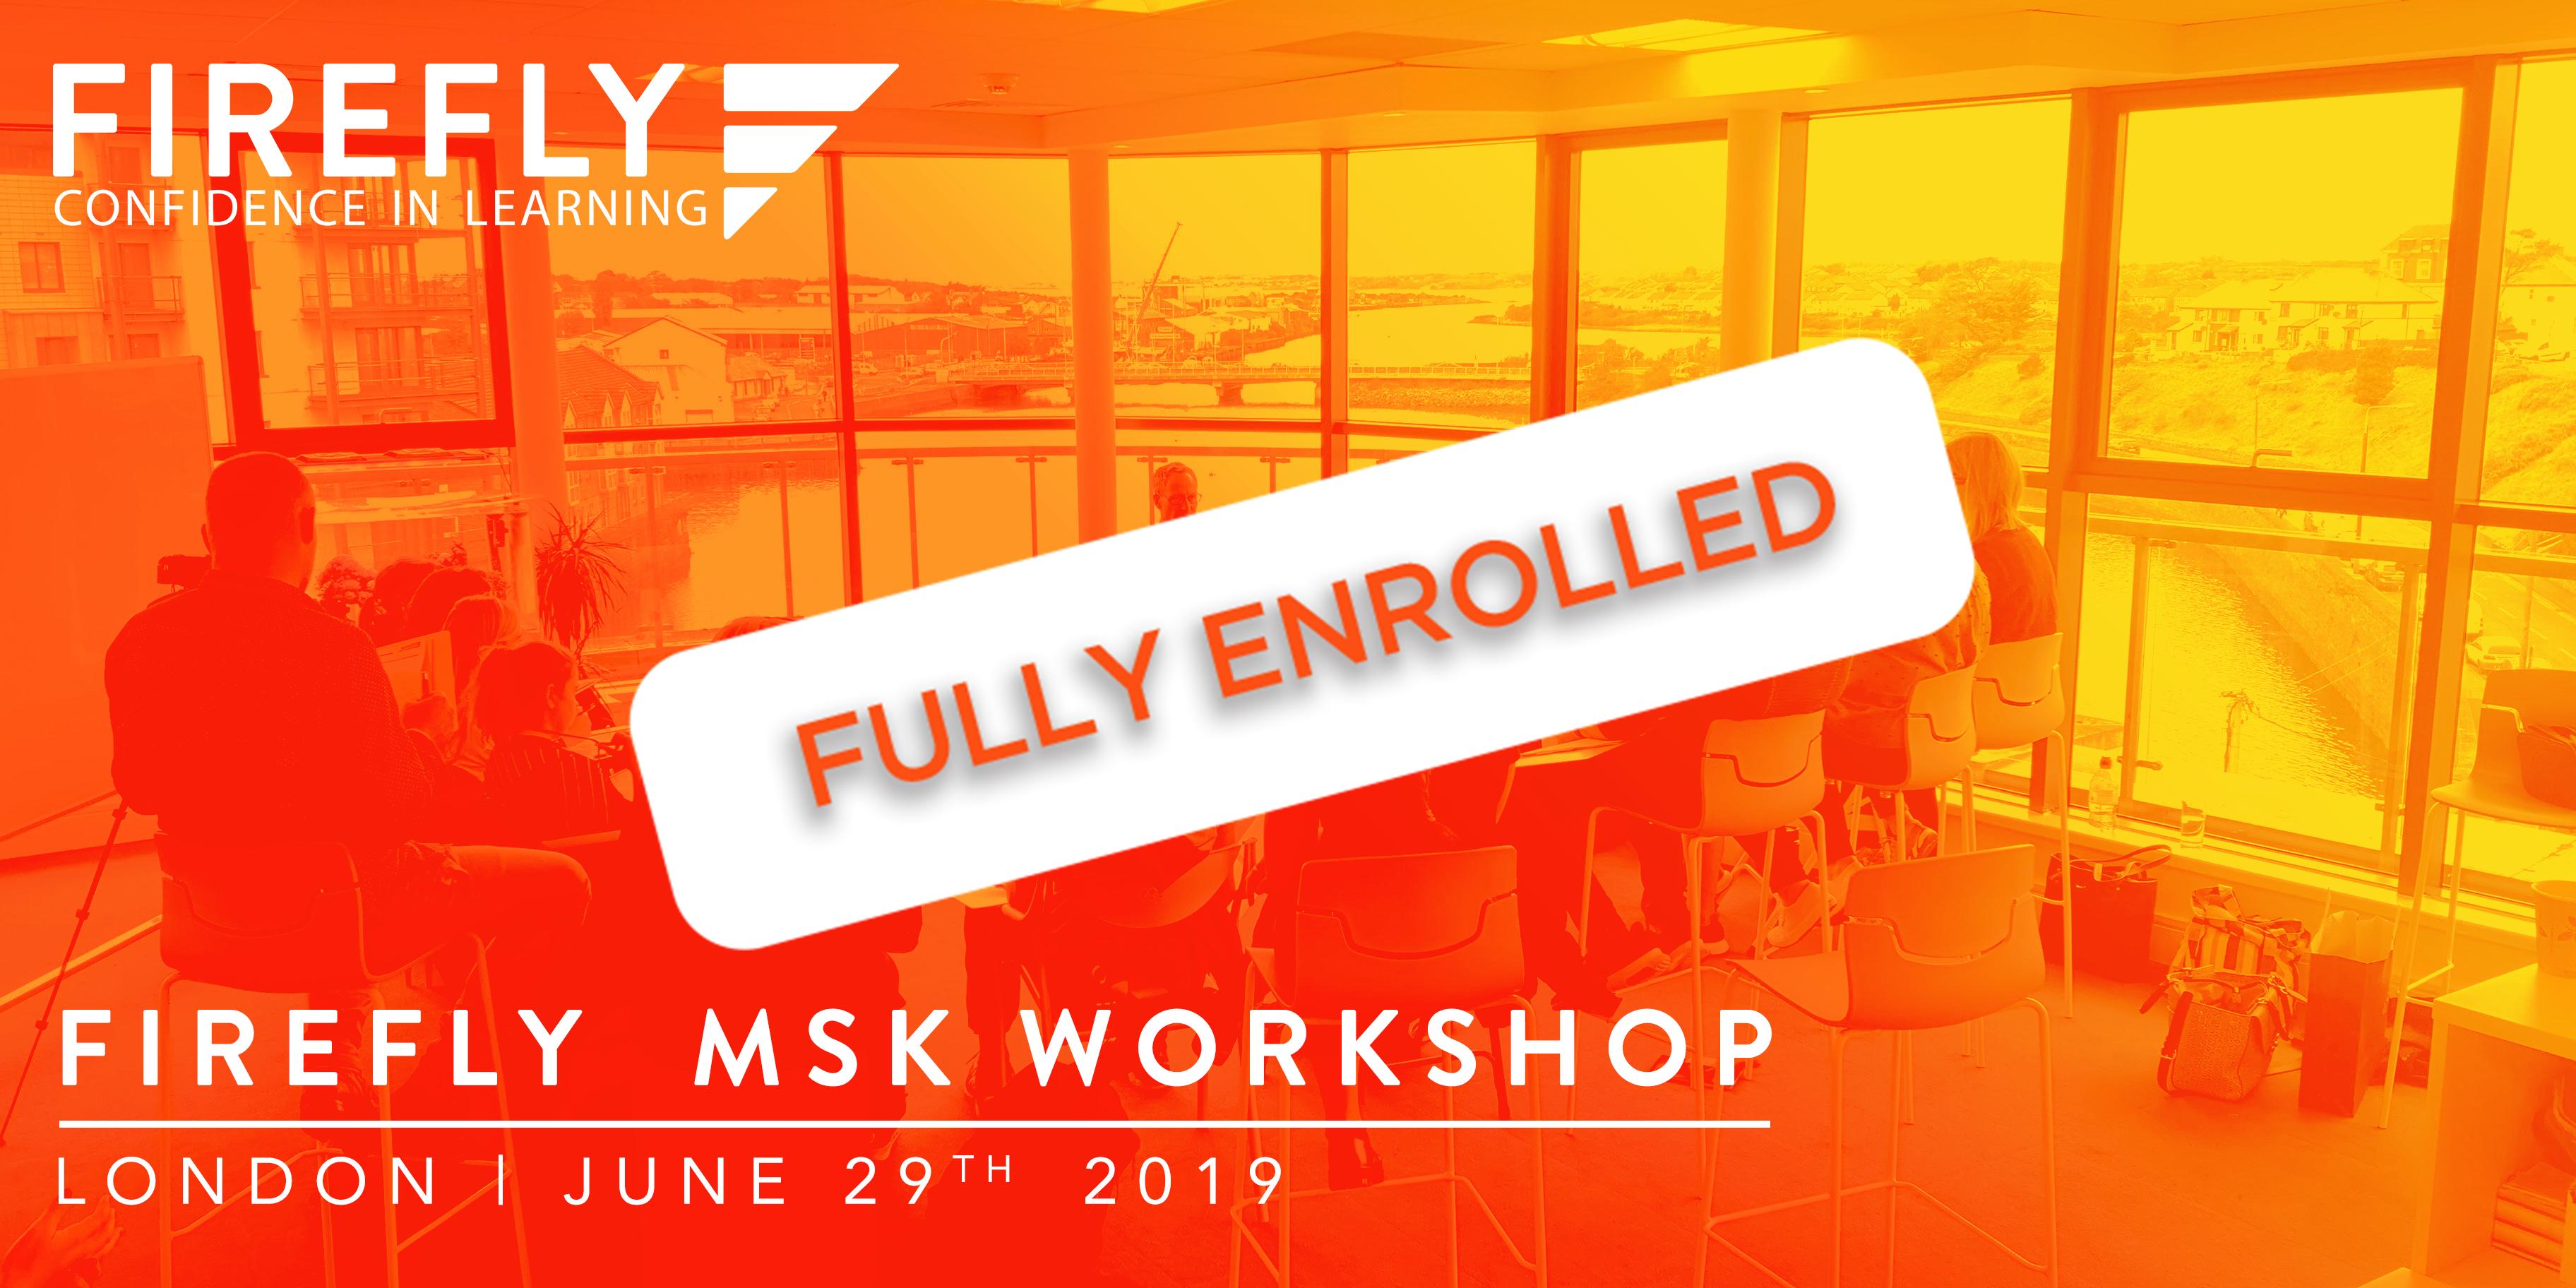 Firefly MSK Workshop fully enrolled